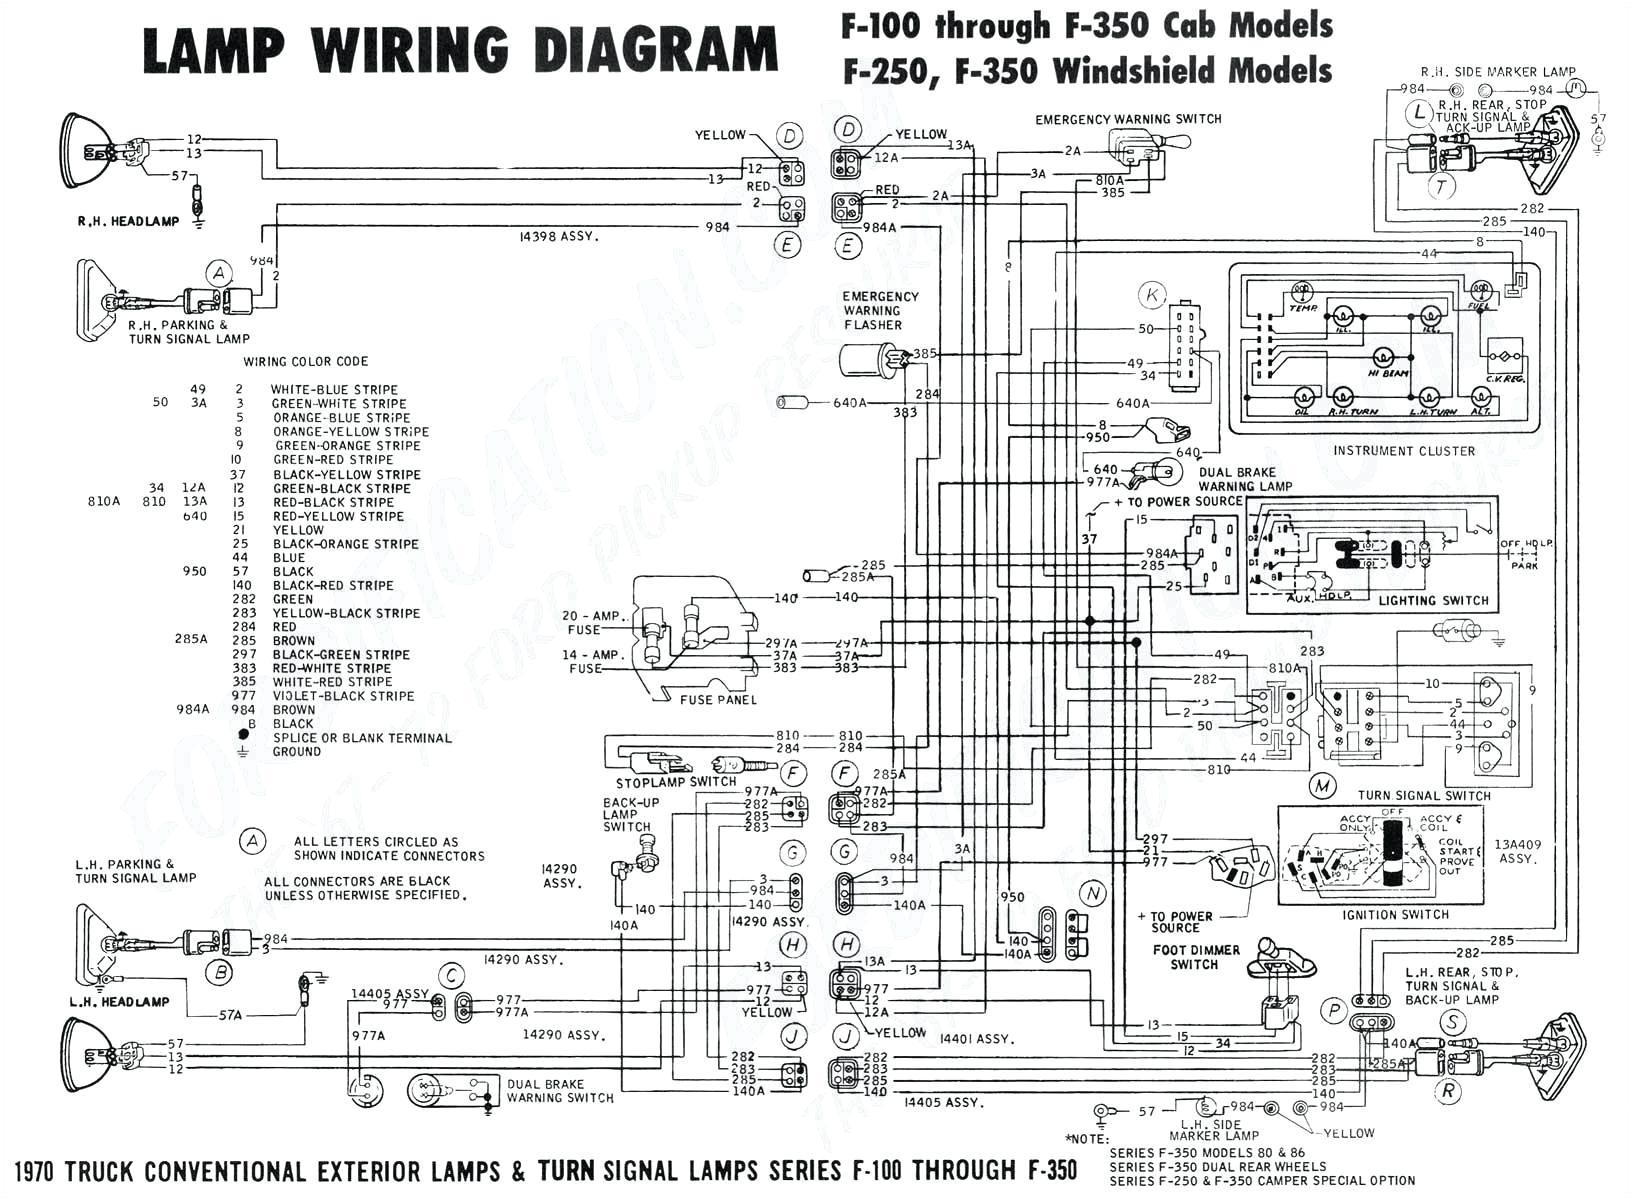 ford ranger fuse diagram imagesr sale by owner xlt box pdf jpg